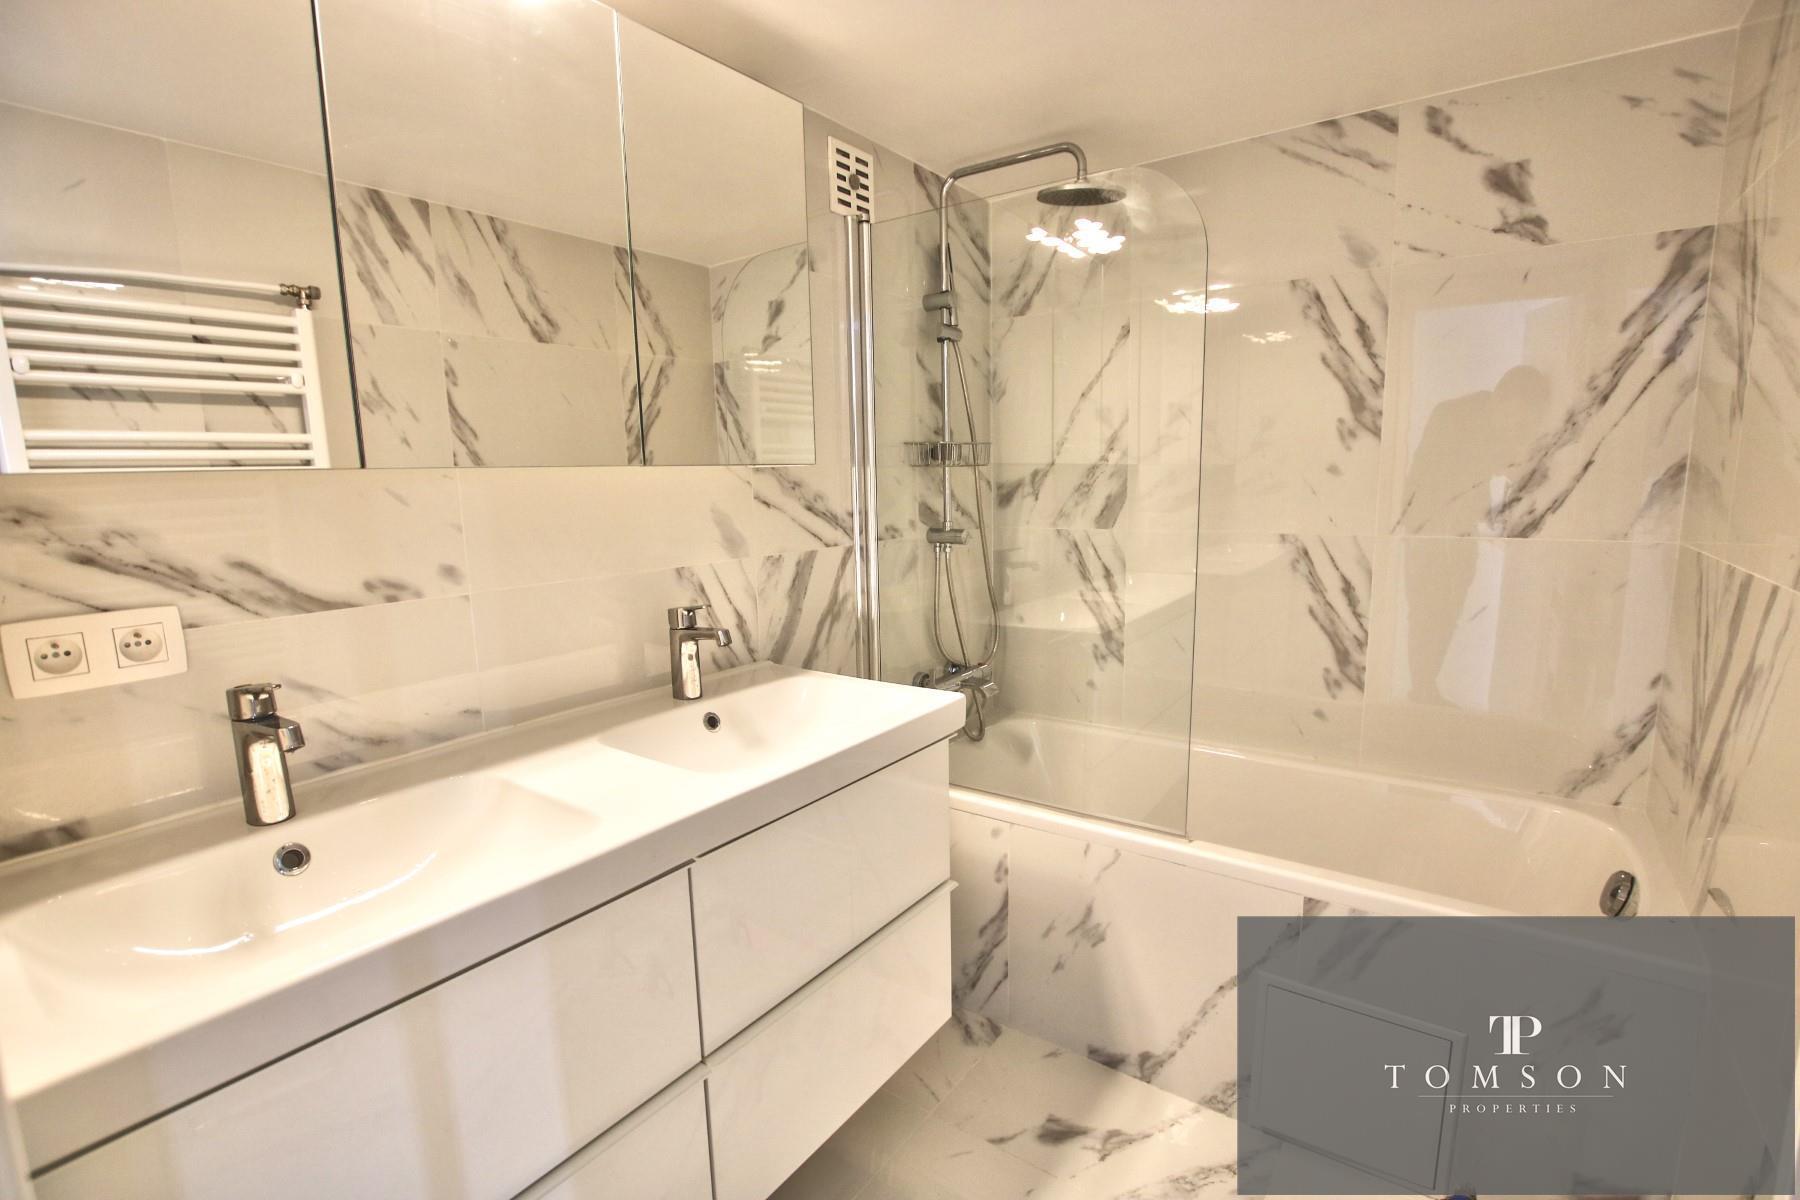 Appartement - Woluwe-Saint-Lambert - #4115211-5